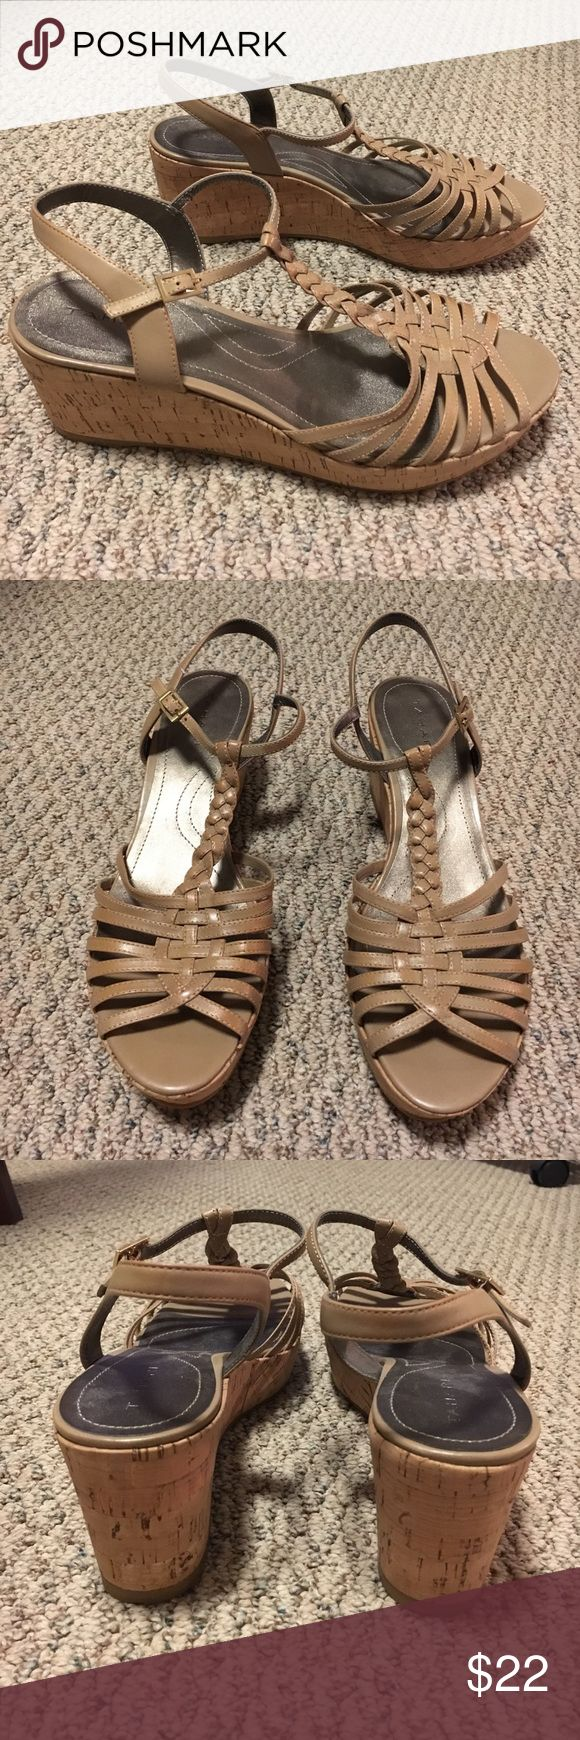 "Strapping Tahari Cork Wedges 4"" Cork wedge, braided strappy sandal Tahari Shoes Wedges"